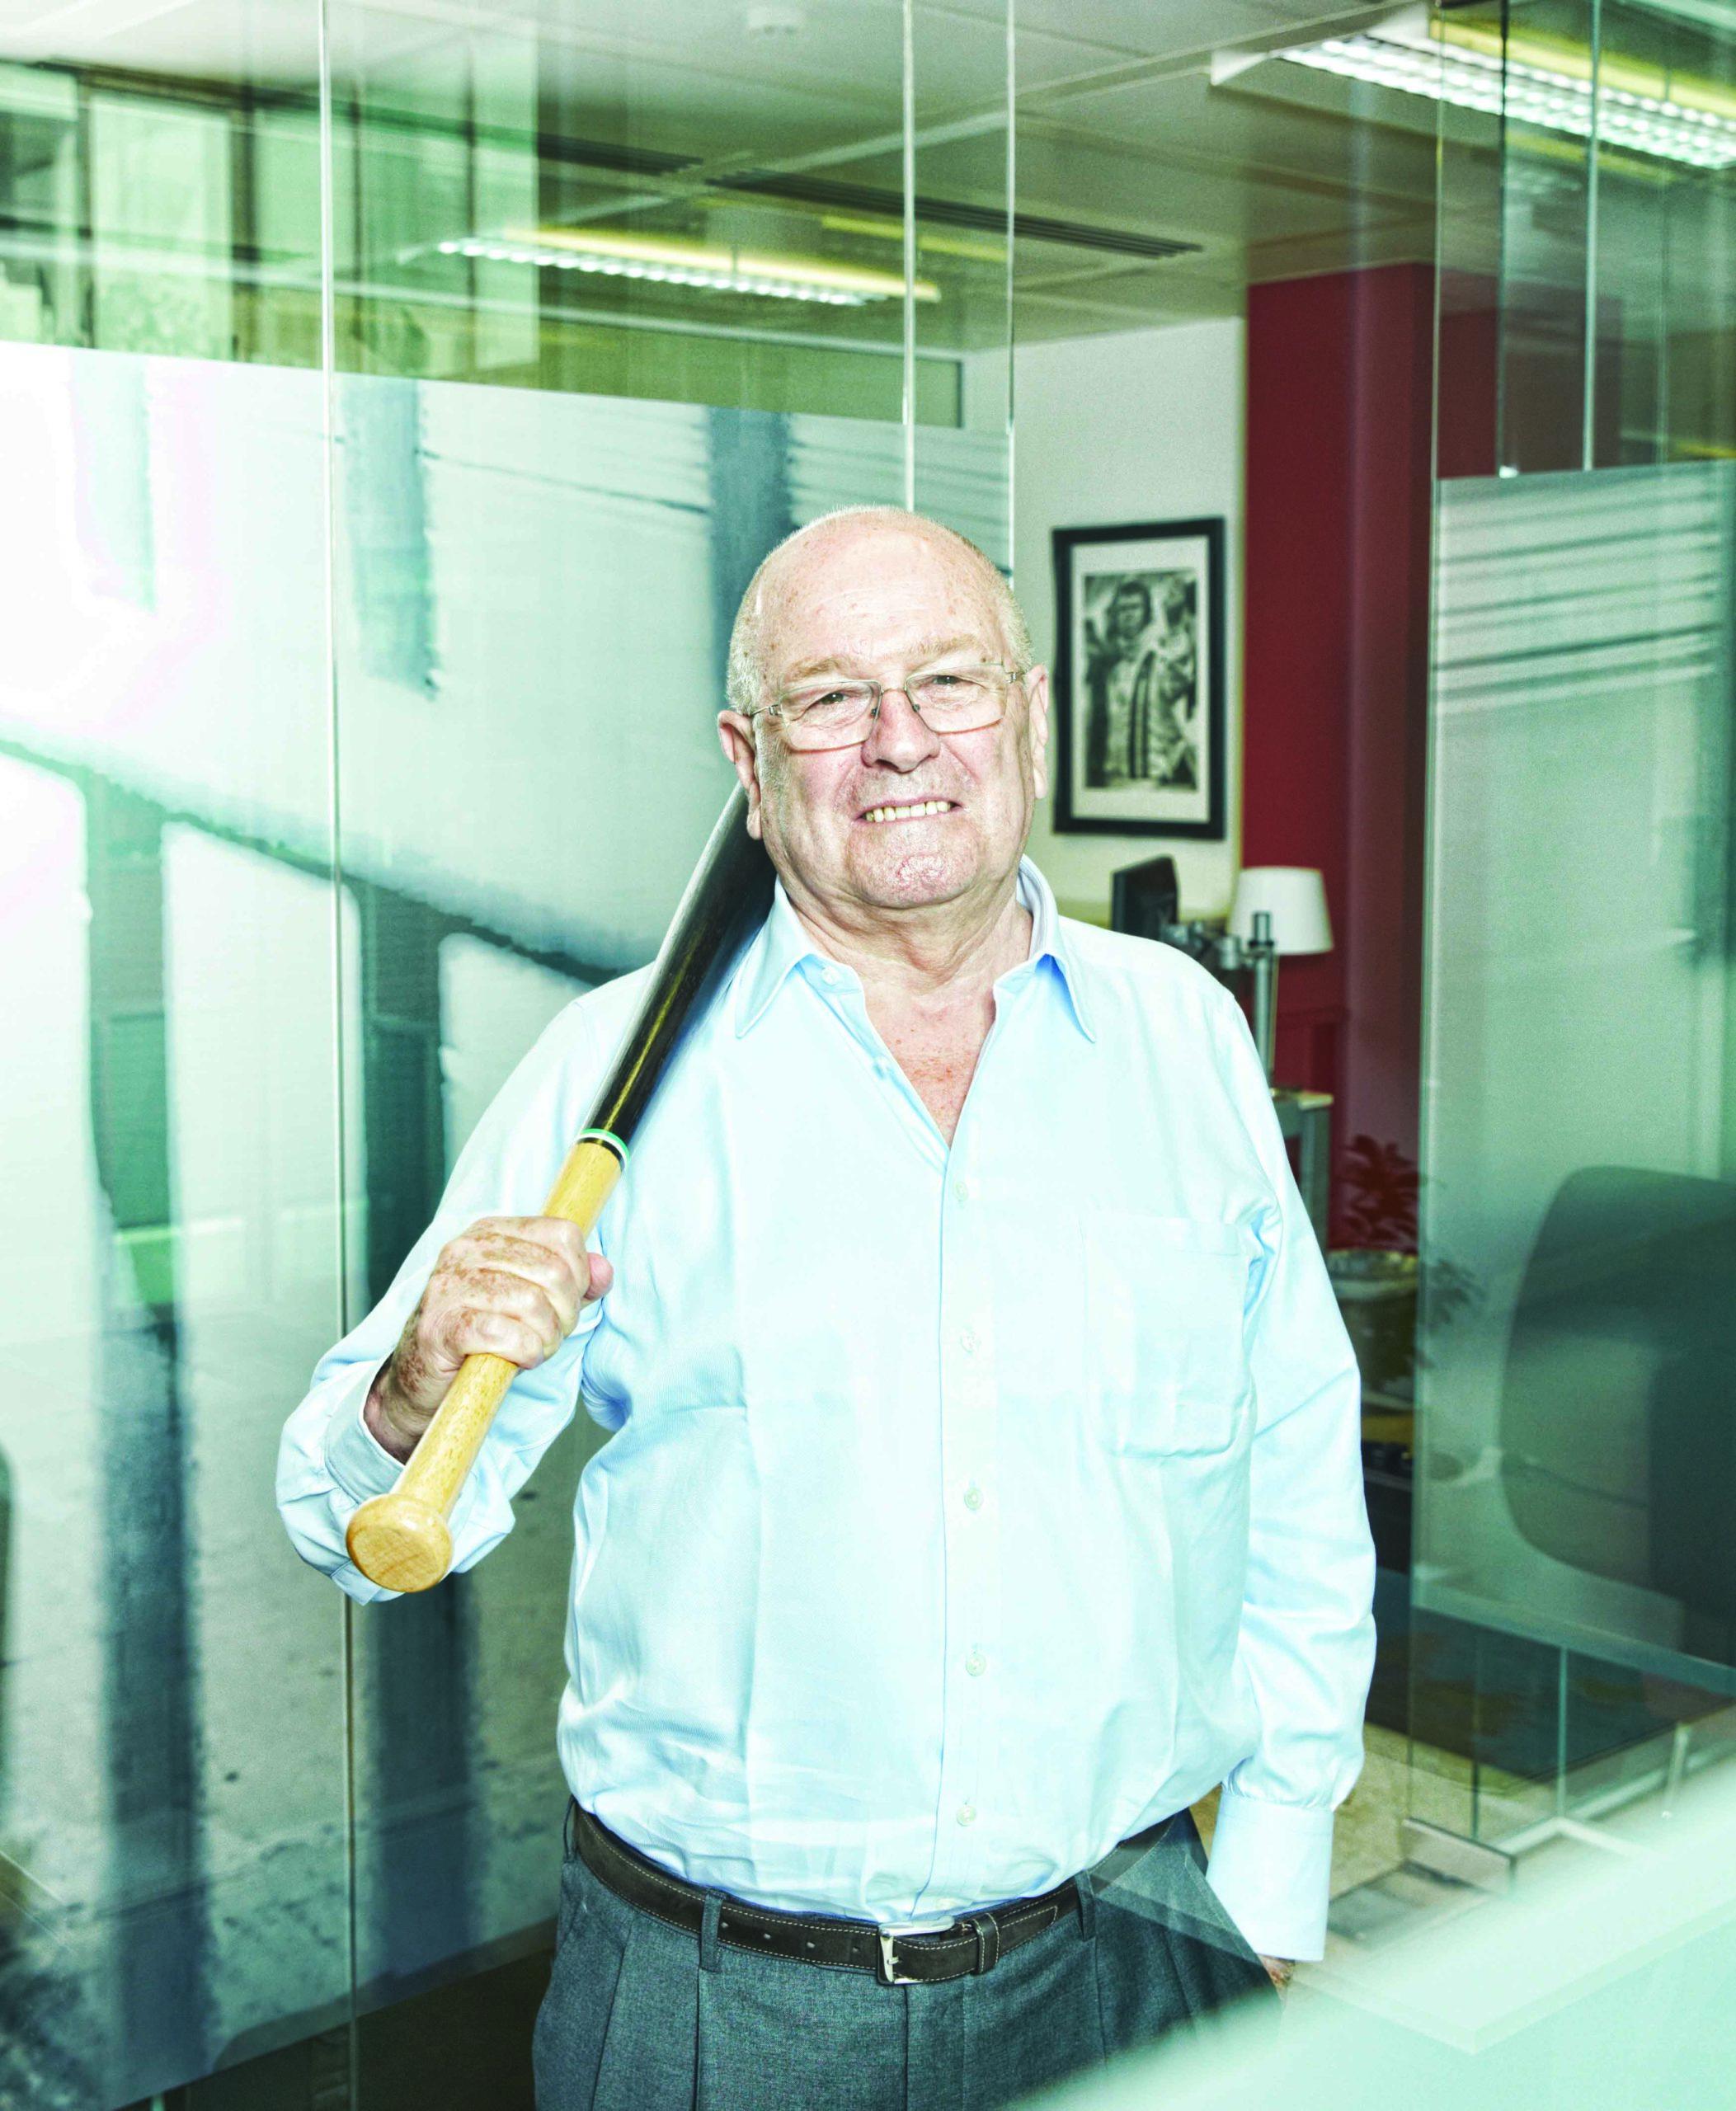 John Hogan with baseball bat